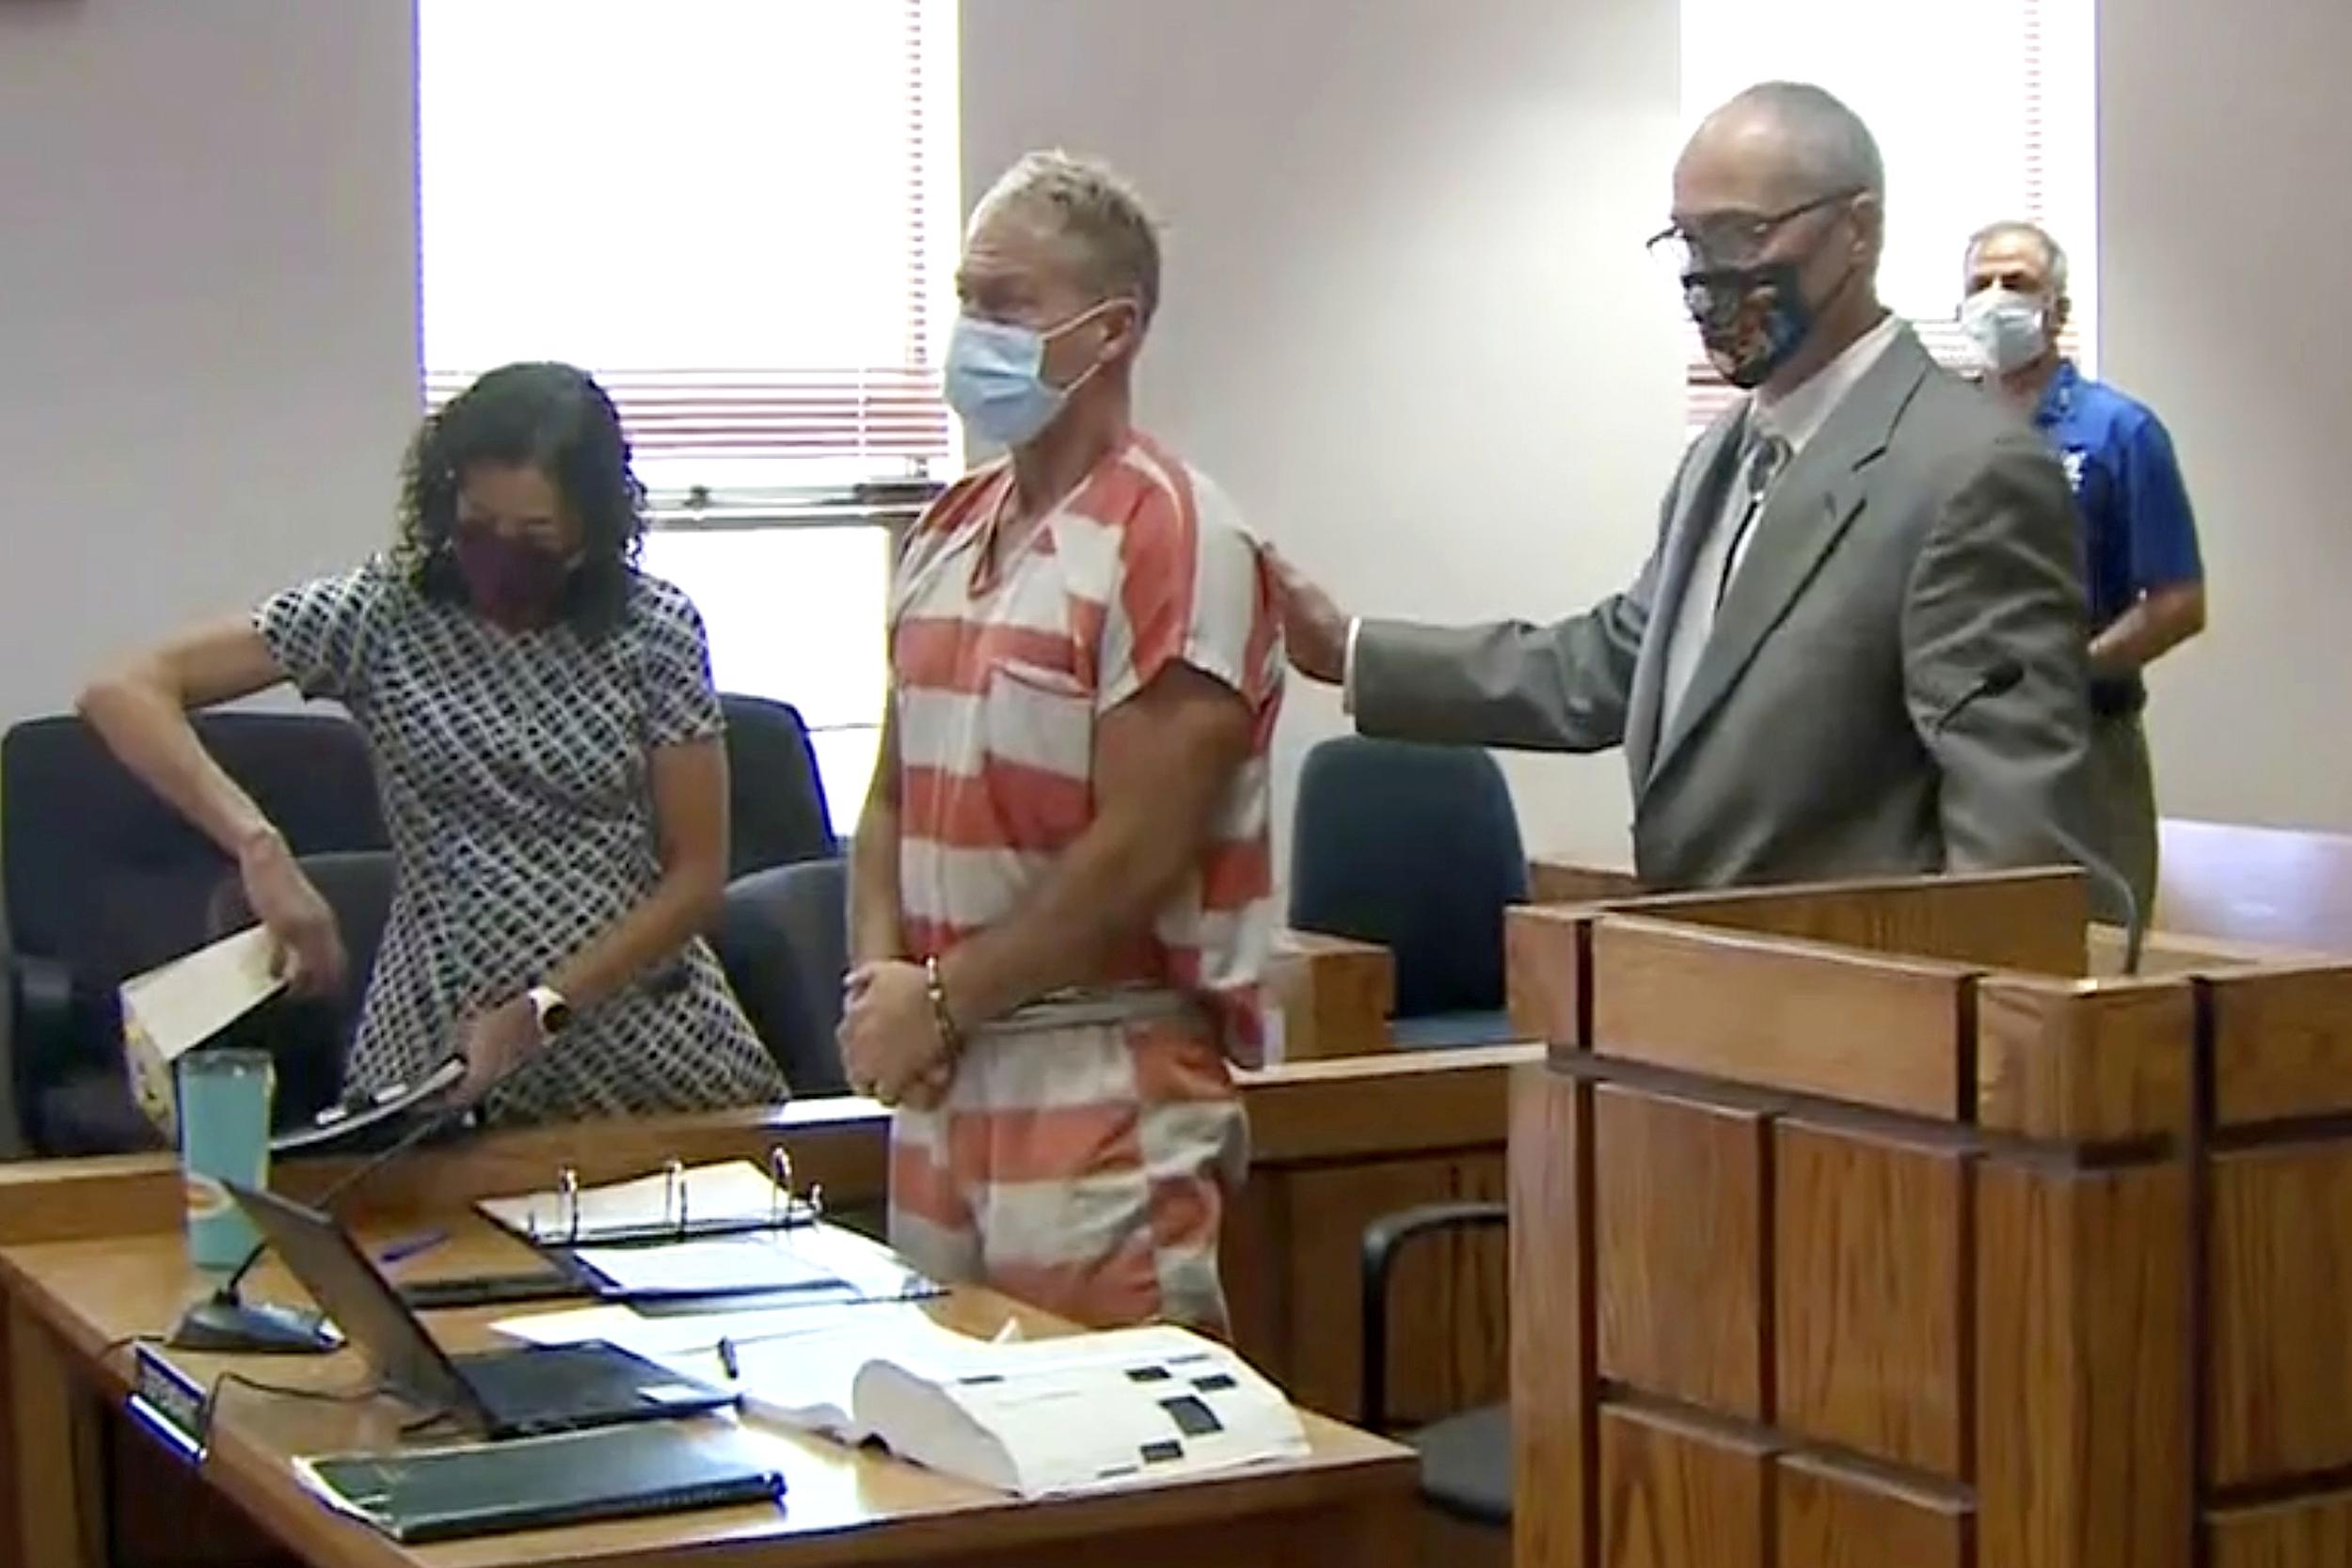 Colorado man 'hunted' down wife in murder plot, authorities allege